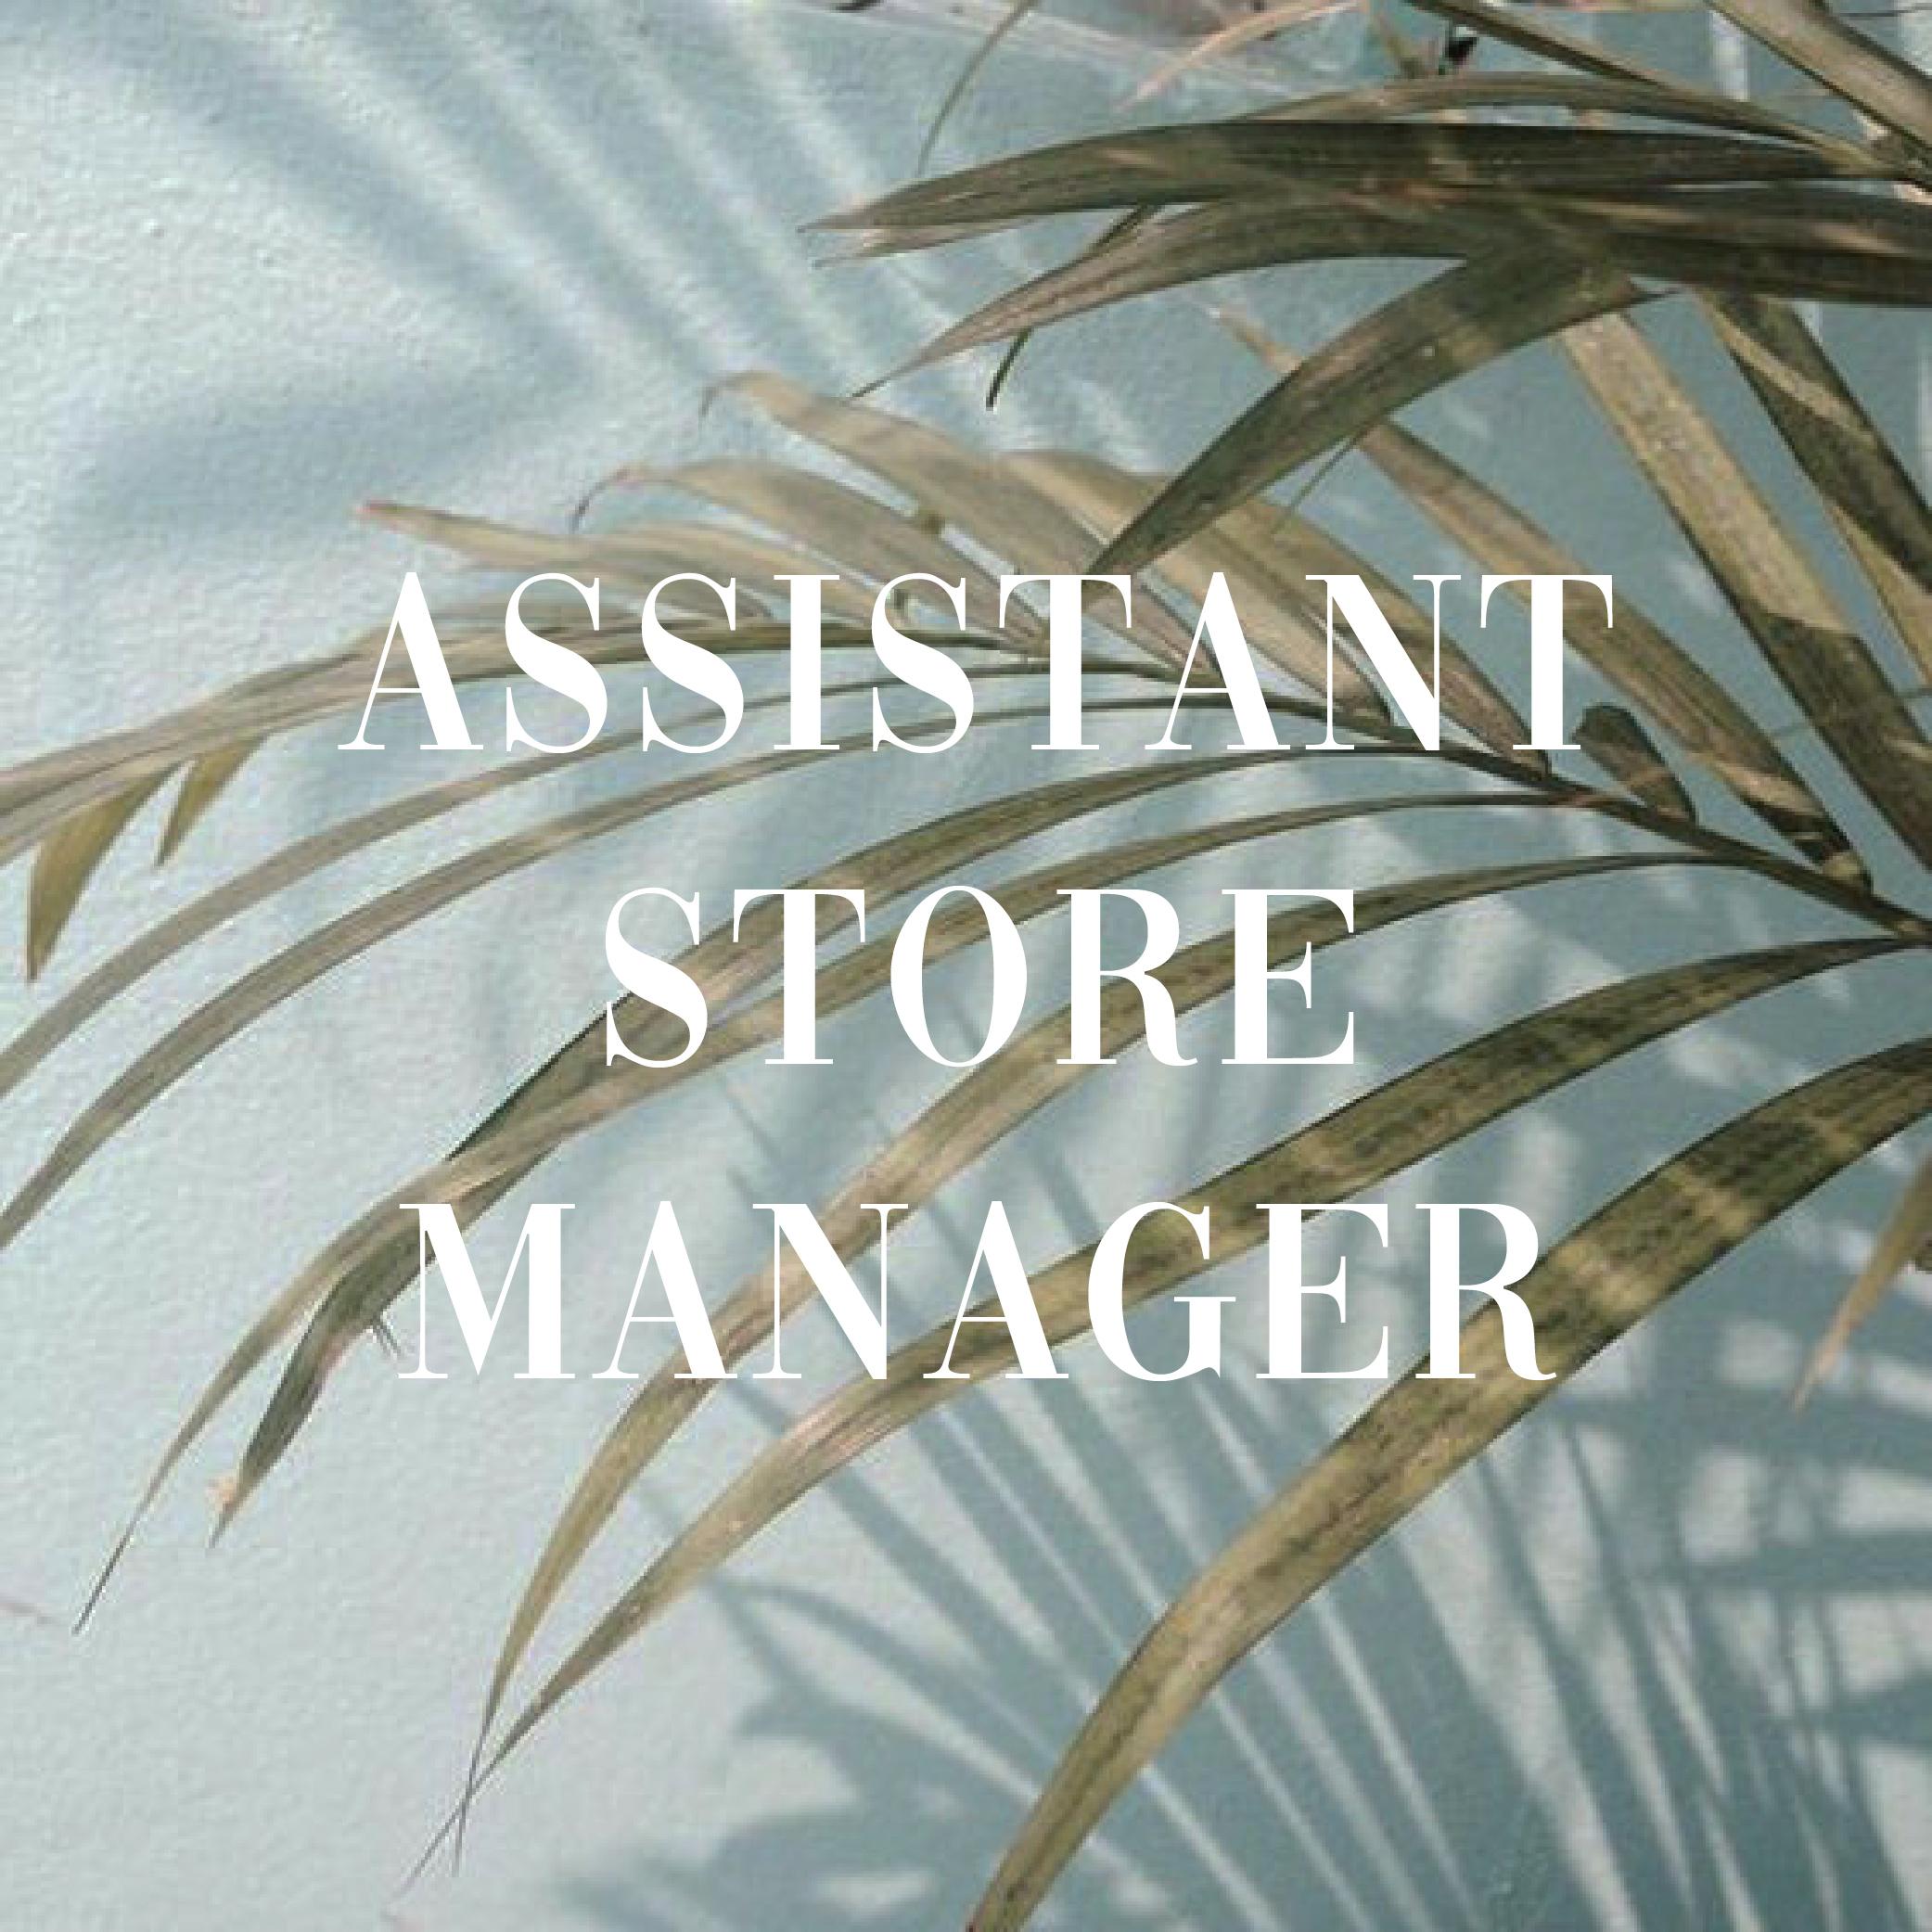 AssistantStoreManagerIcon.jpg